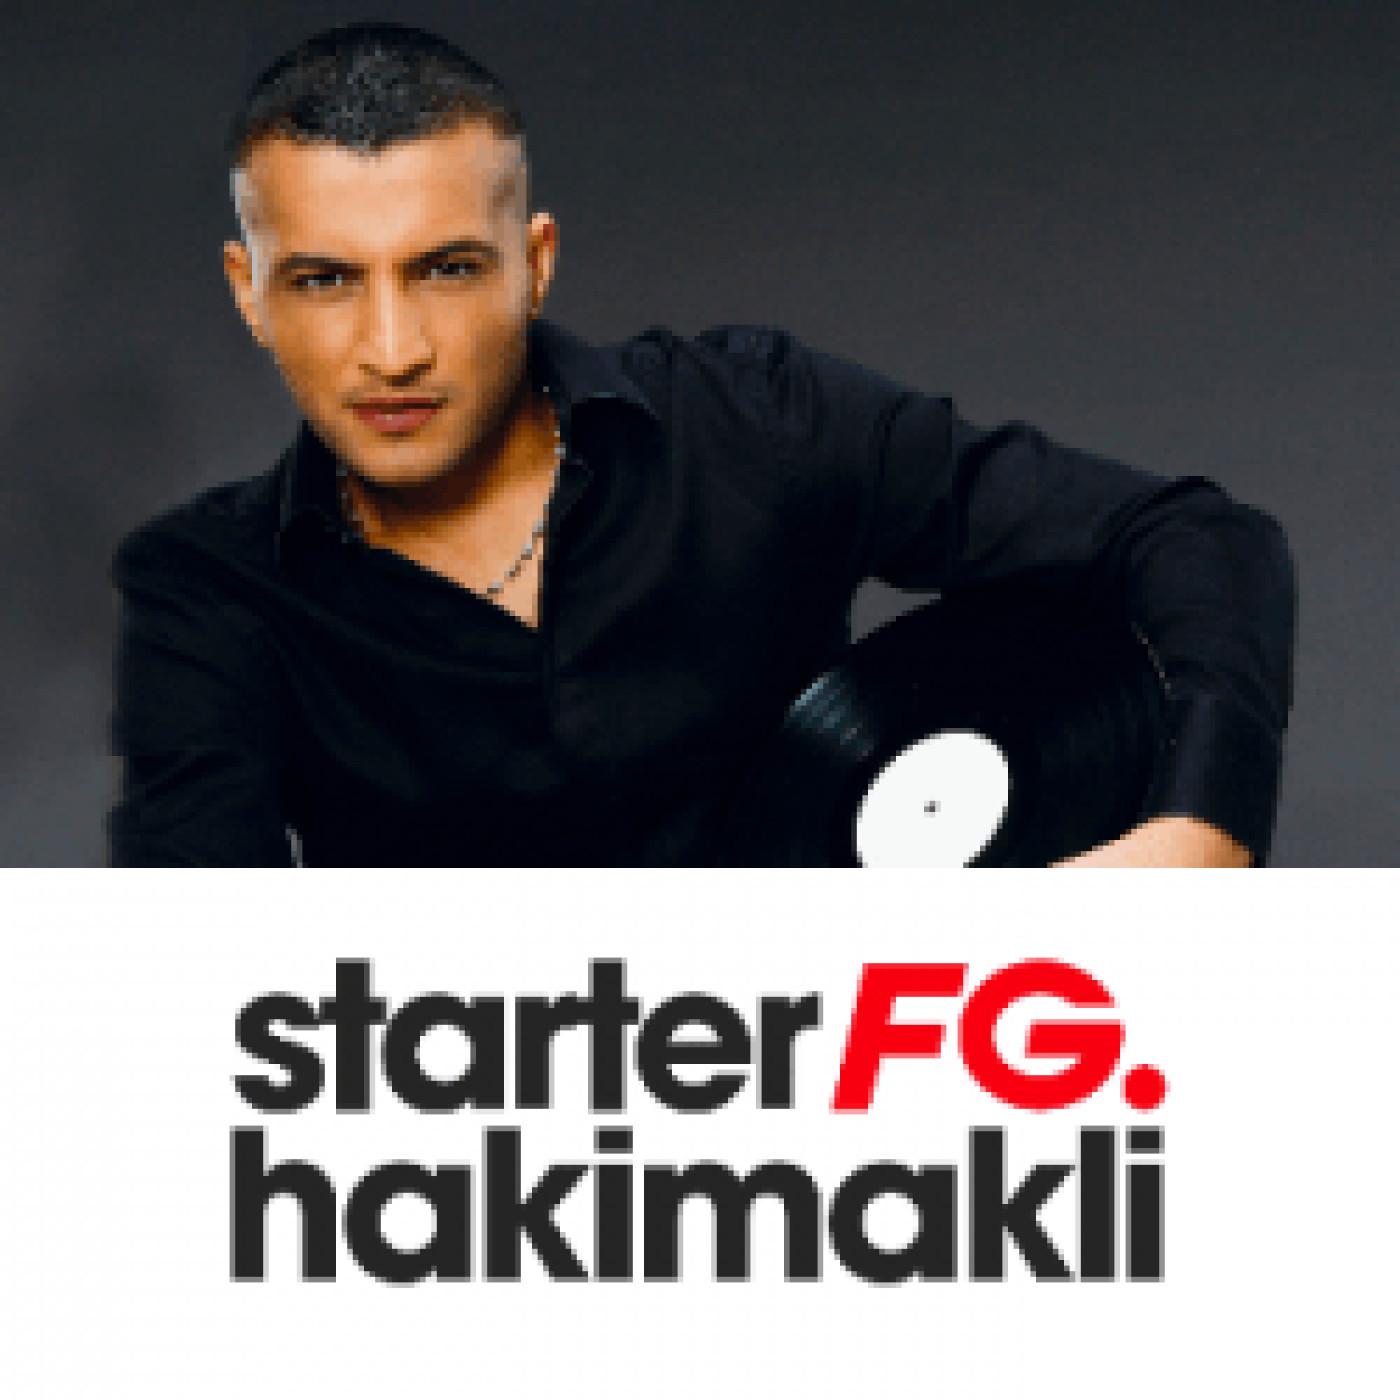 STARTER FG BY HAKIMAKLI JEUDI 05 NOVEMBRE 2020